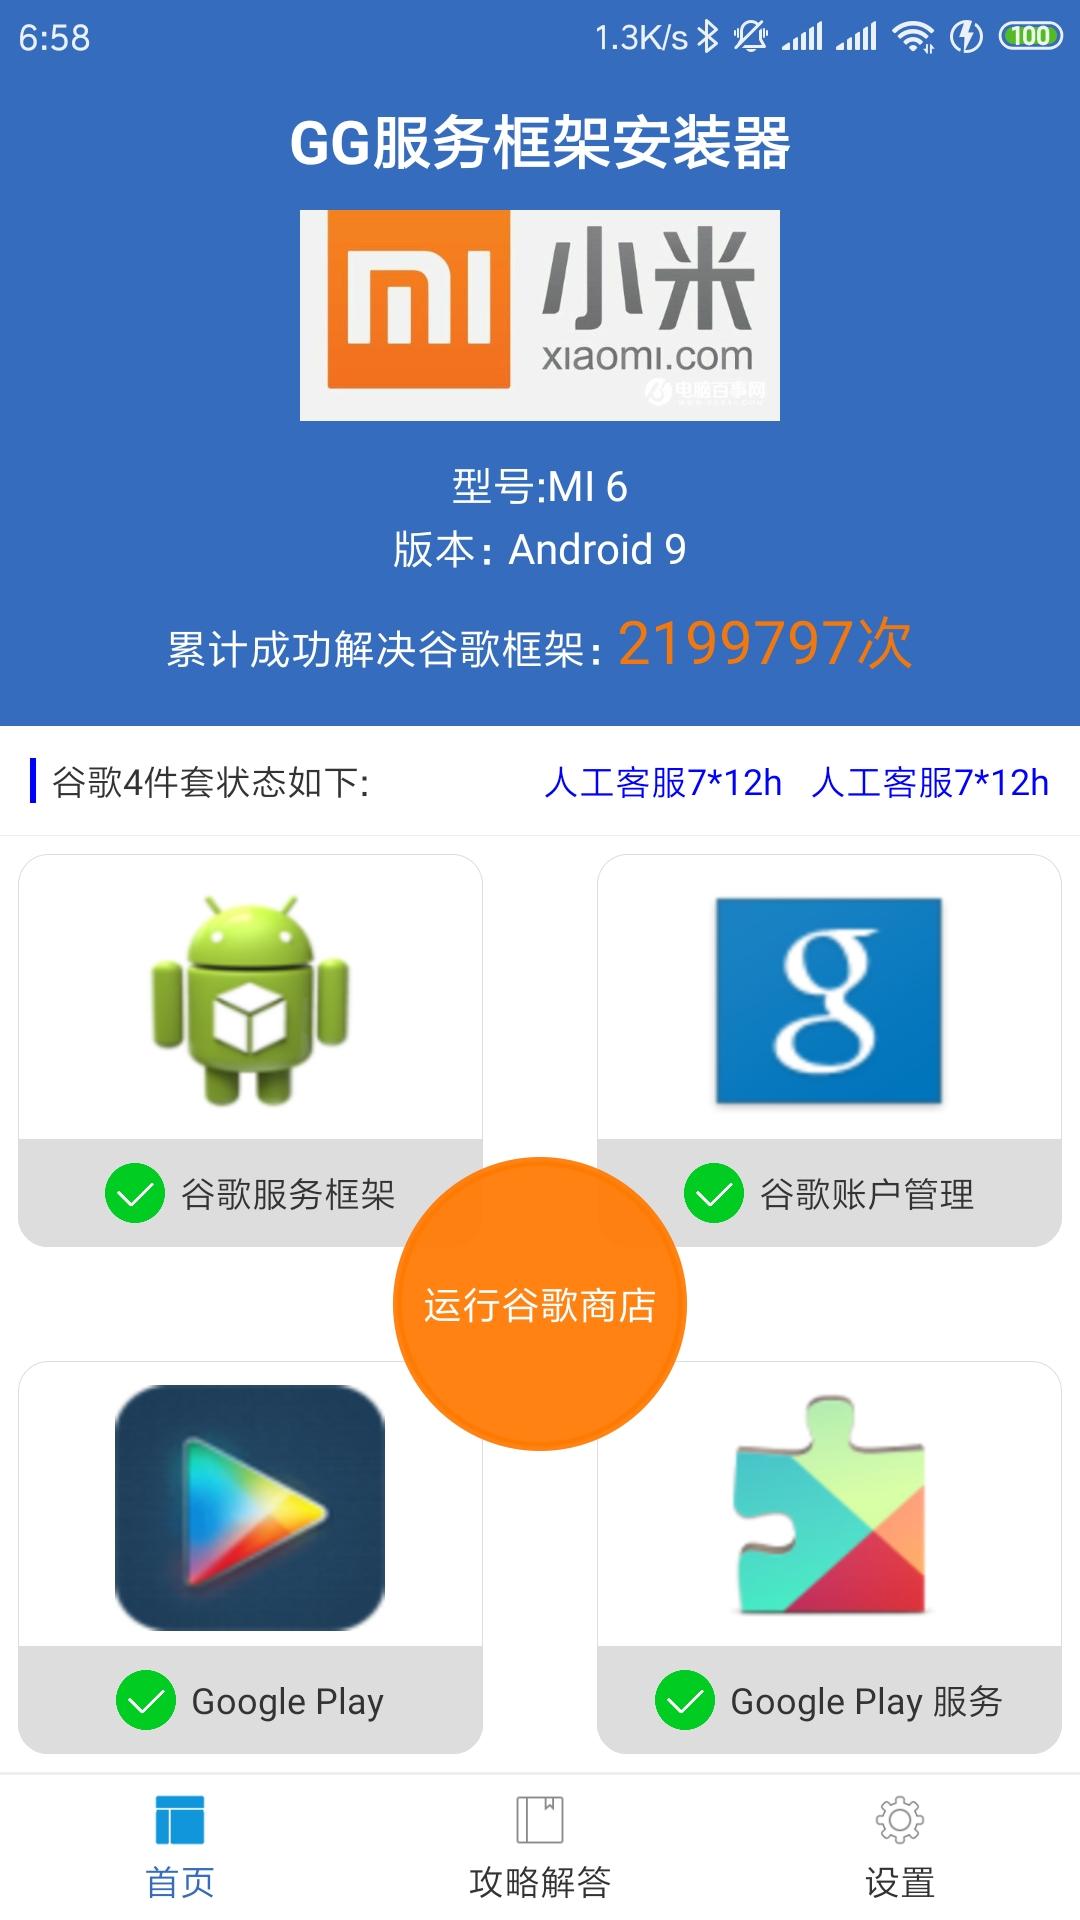 GG服务框架安装器:一键安装谷歌套件